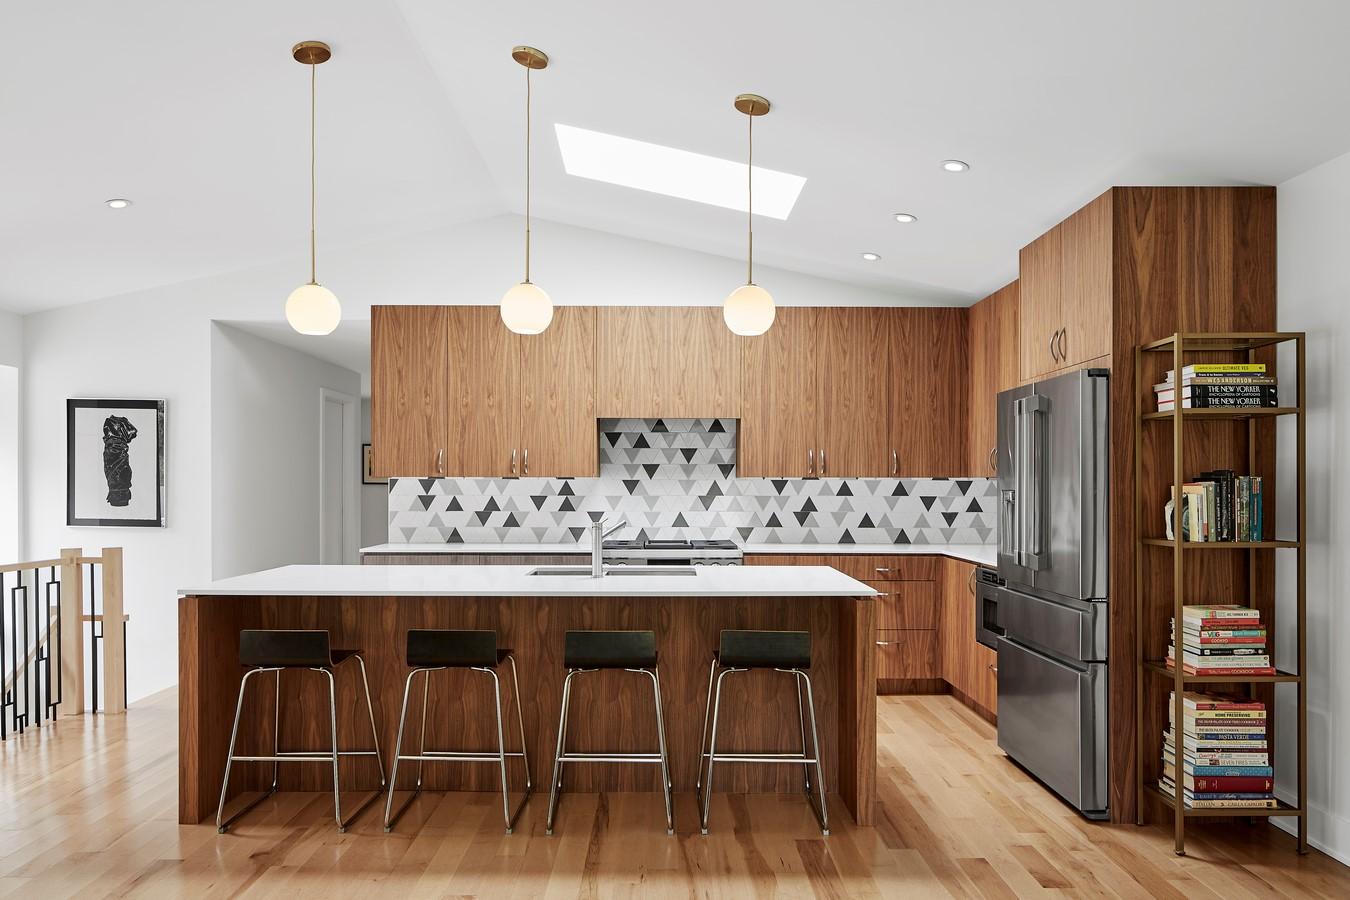 5059 Etobicoke Mid-Century Modern House by Solares Architecture : Sheet 1